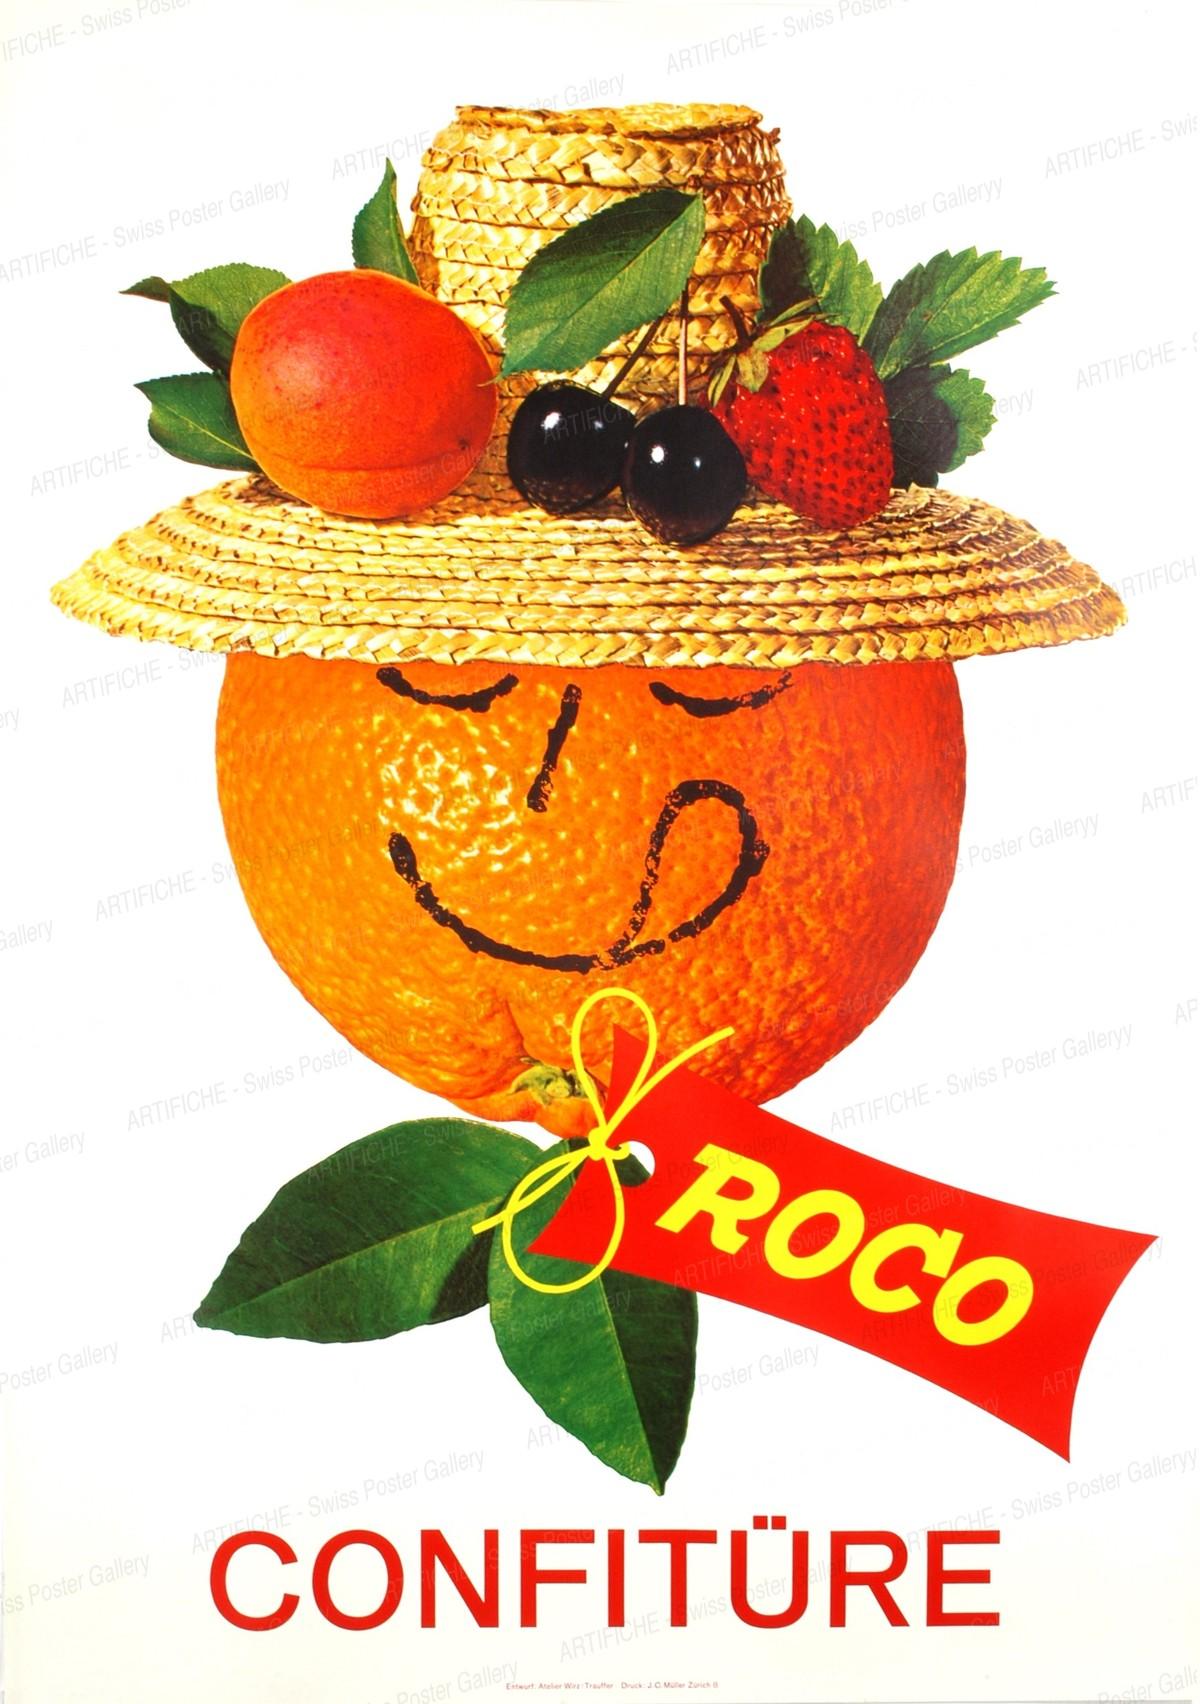 Roco Confitüre, Paul Trauffer